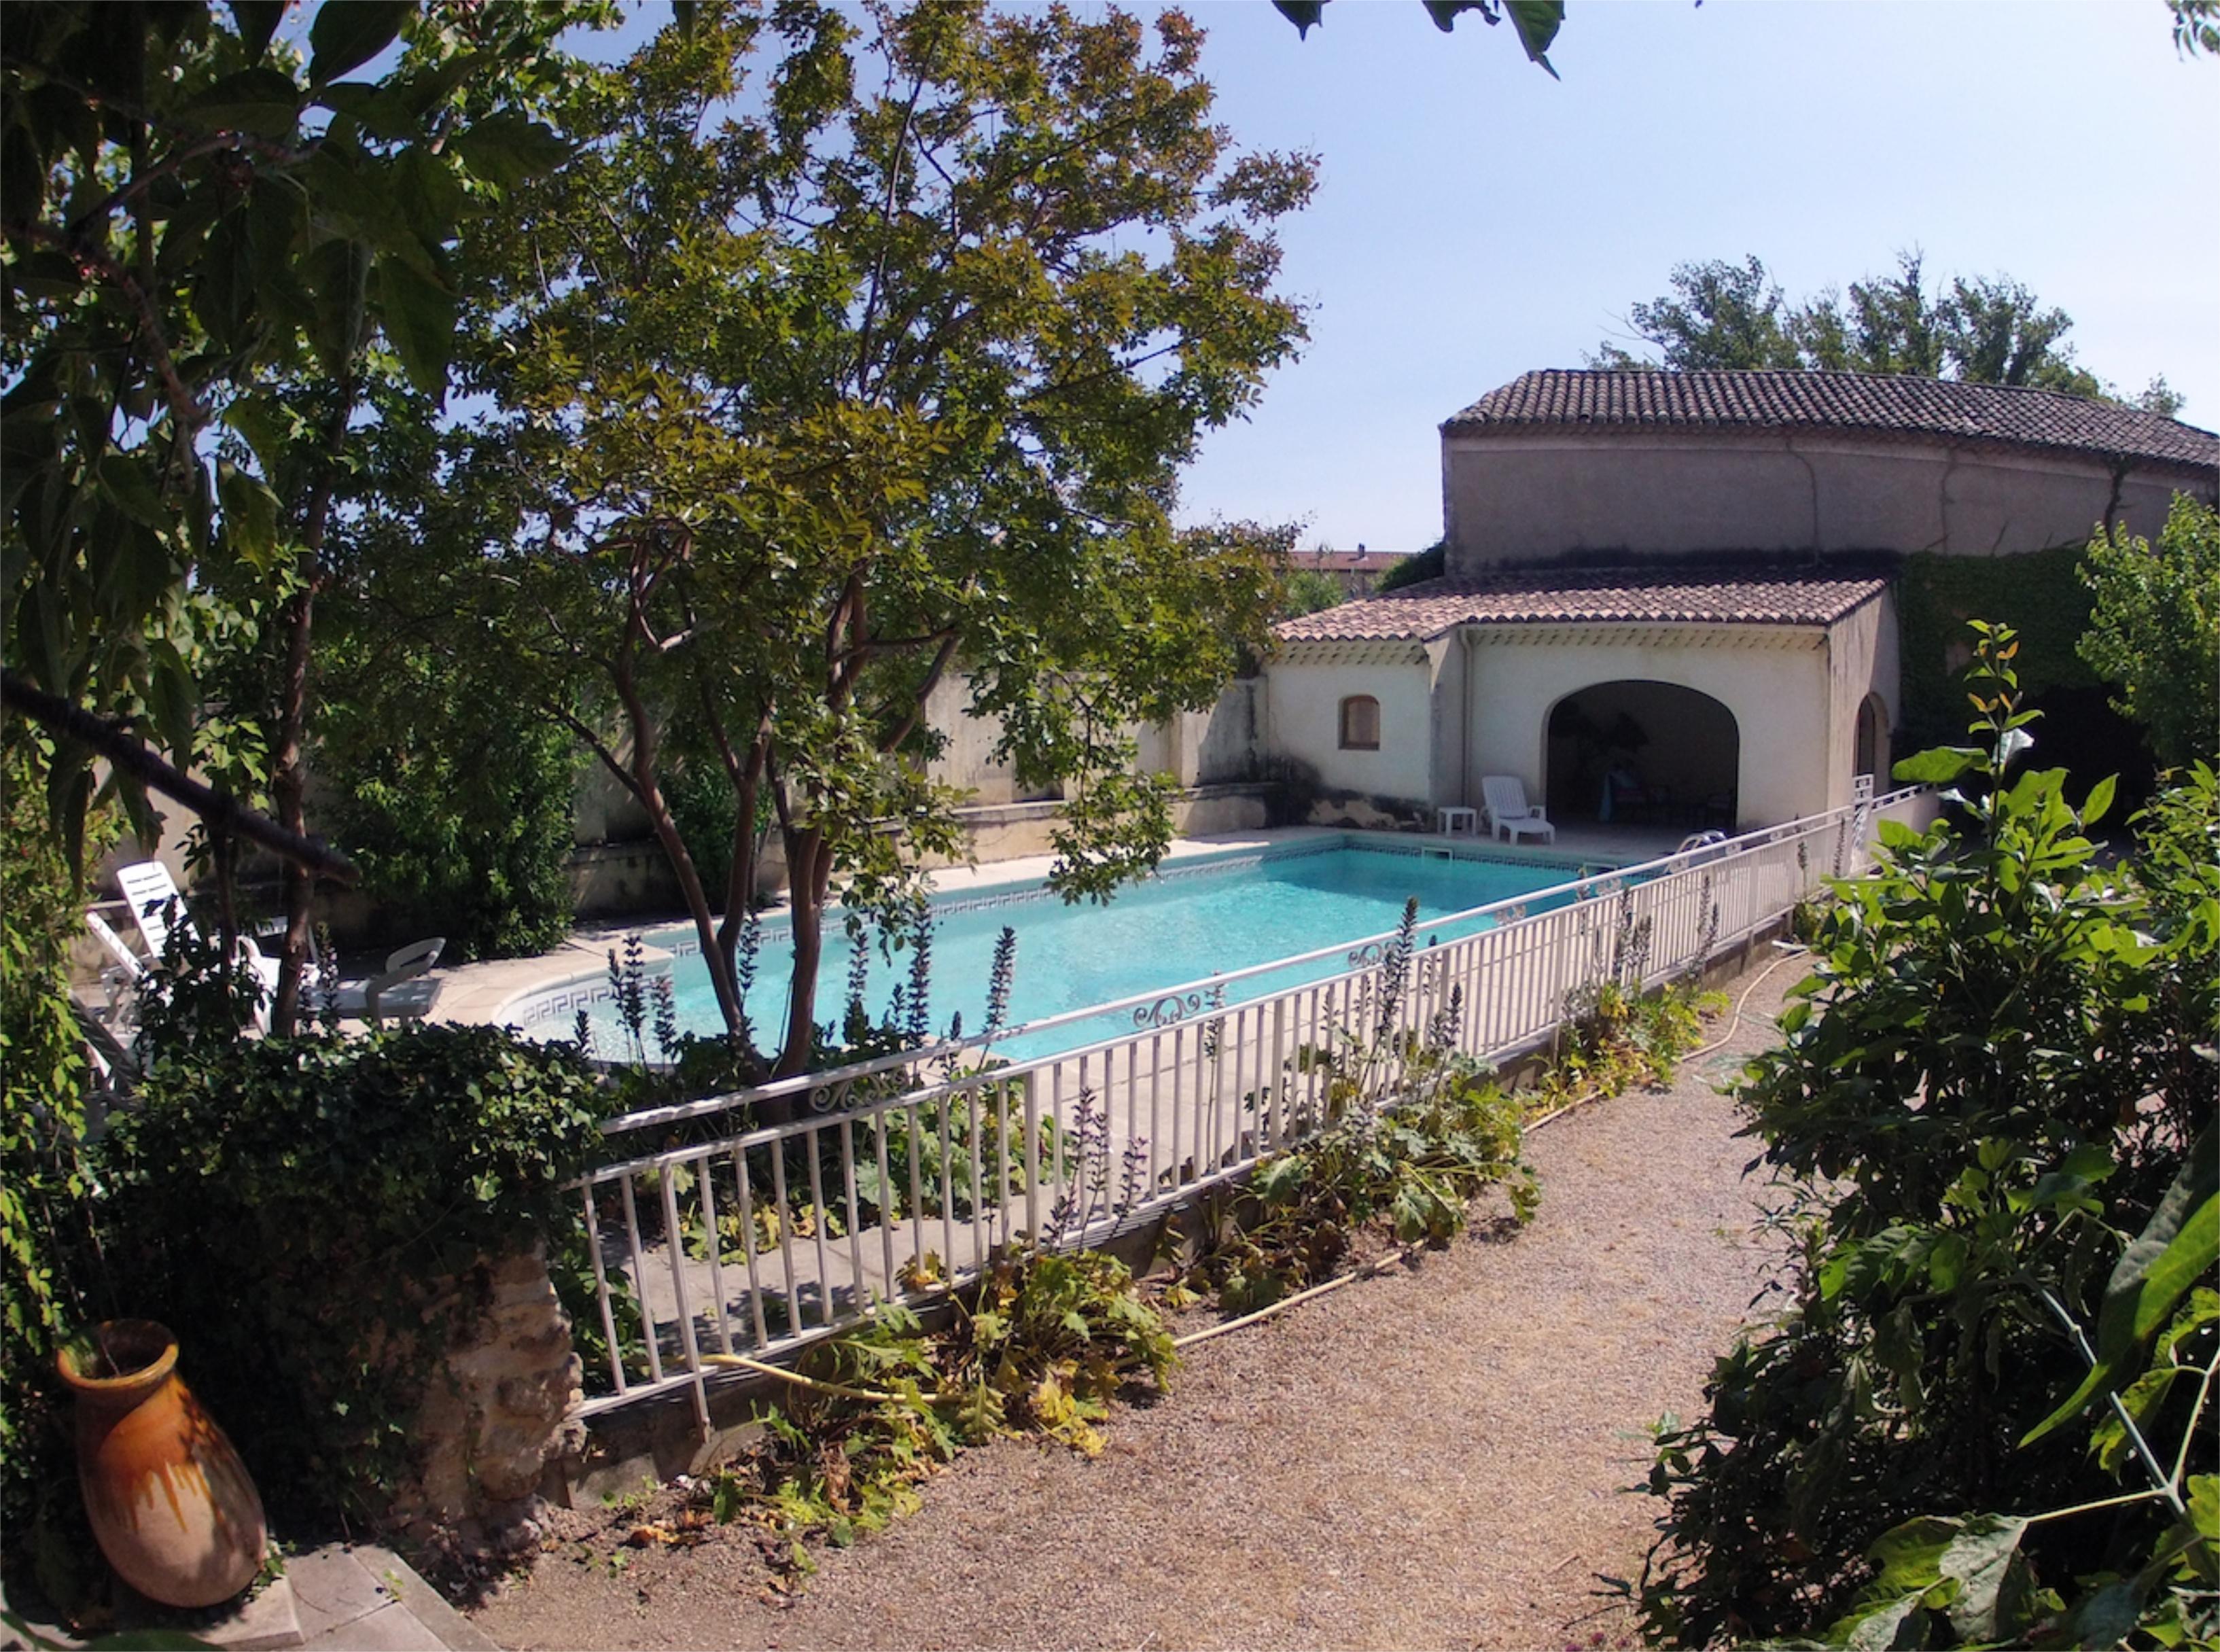 St. C pool